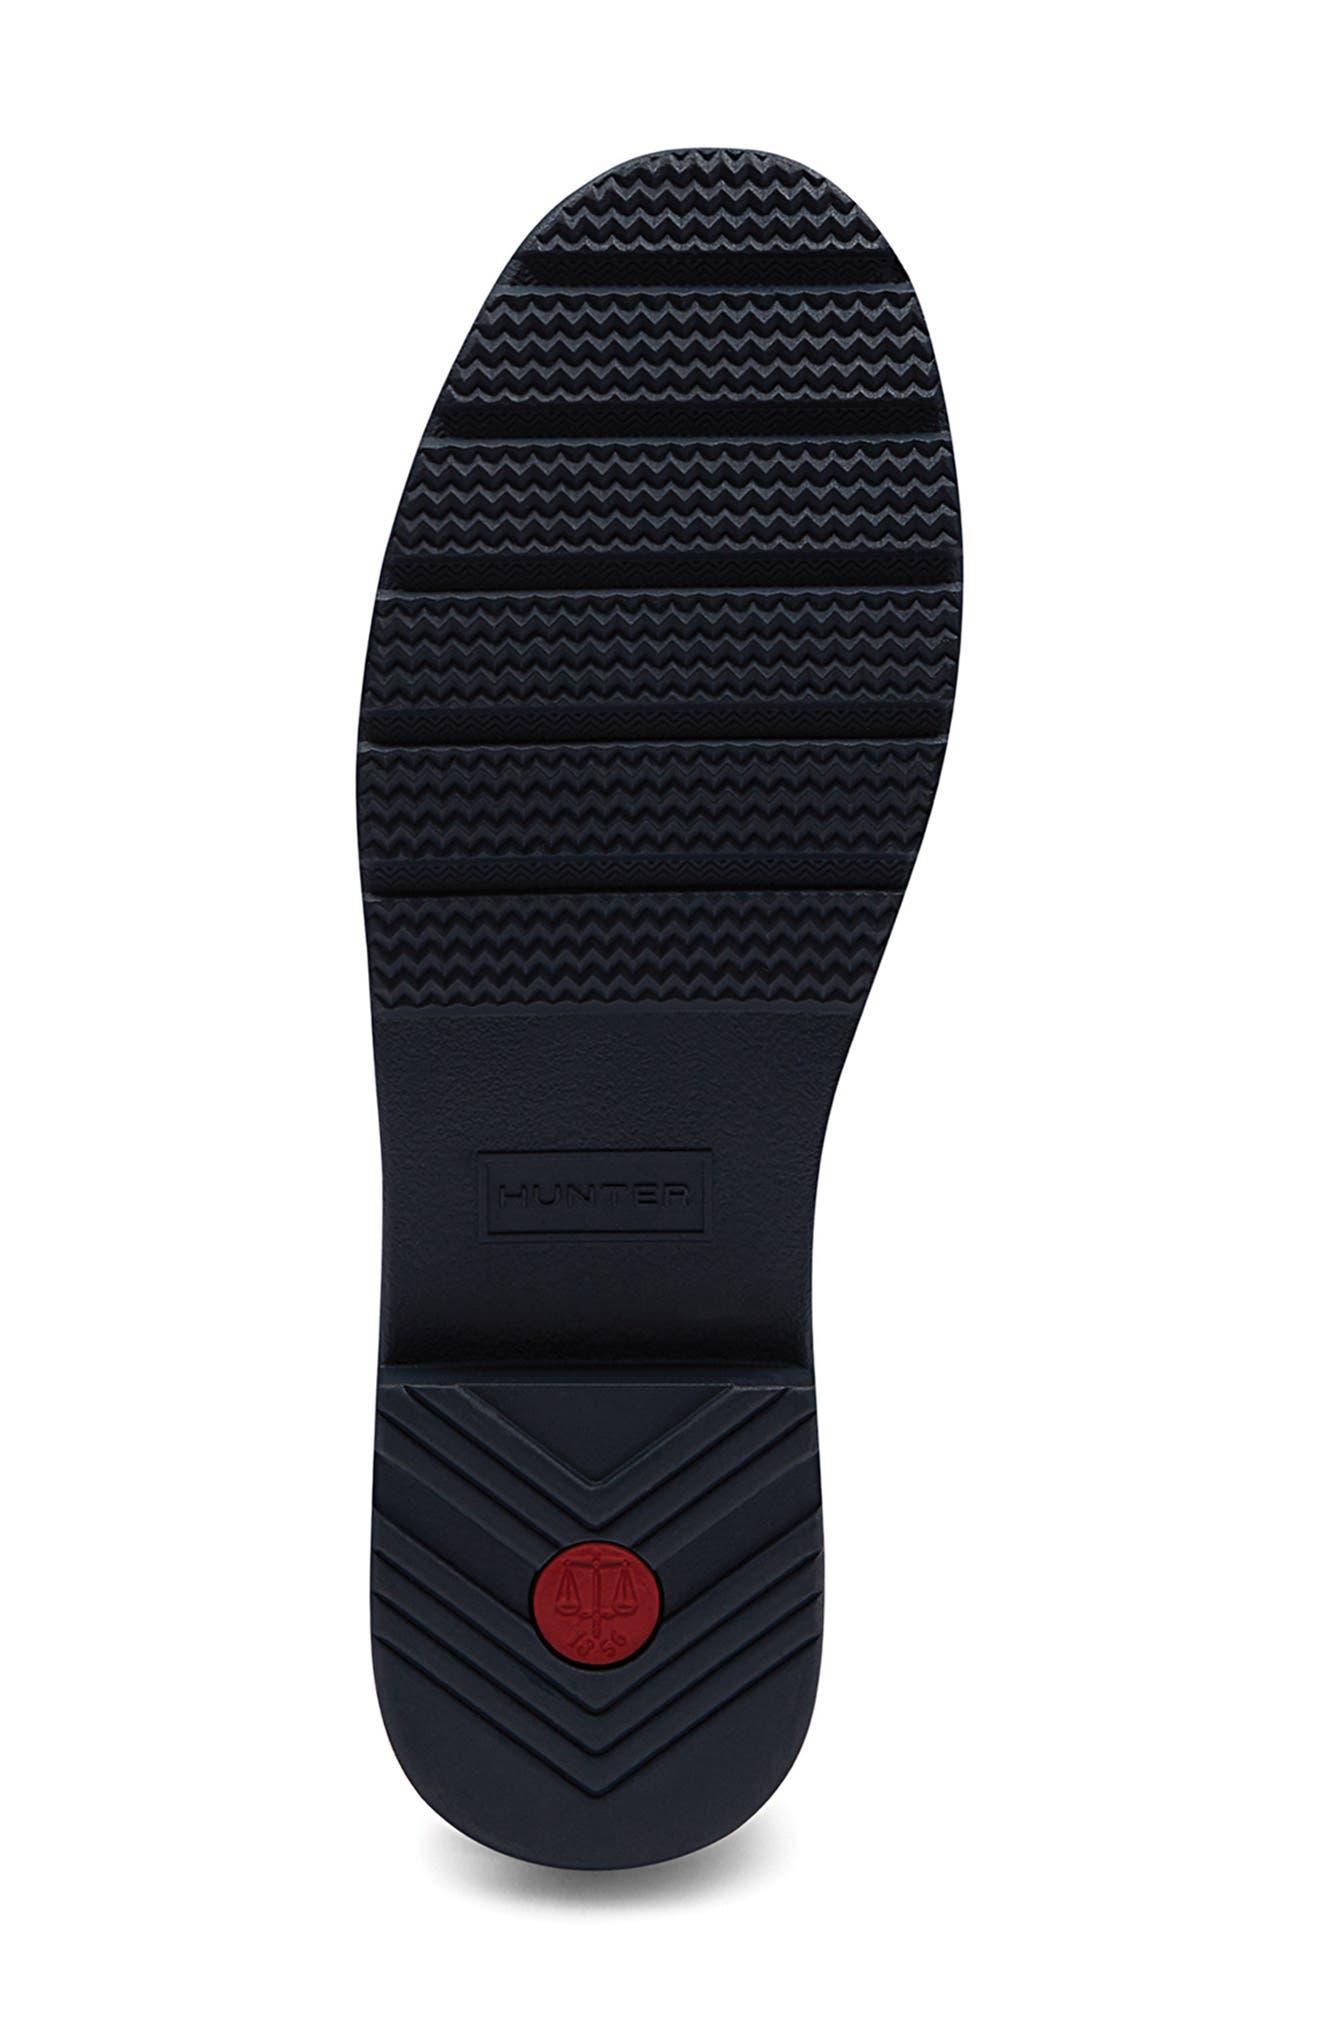 Refined Adjustable Back Knee High Waterproof Rain Boot,                             Alternate thumbnail 4, color,                             NAVY